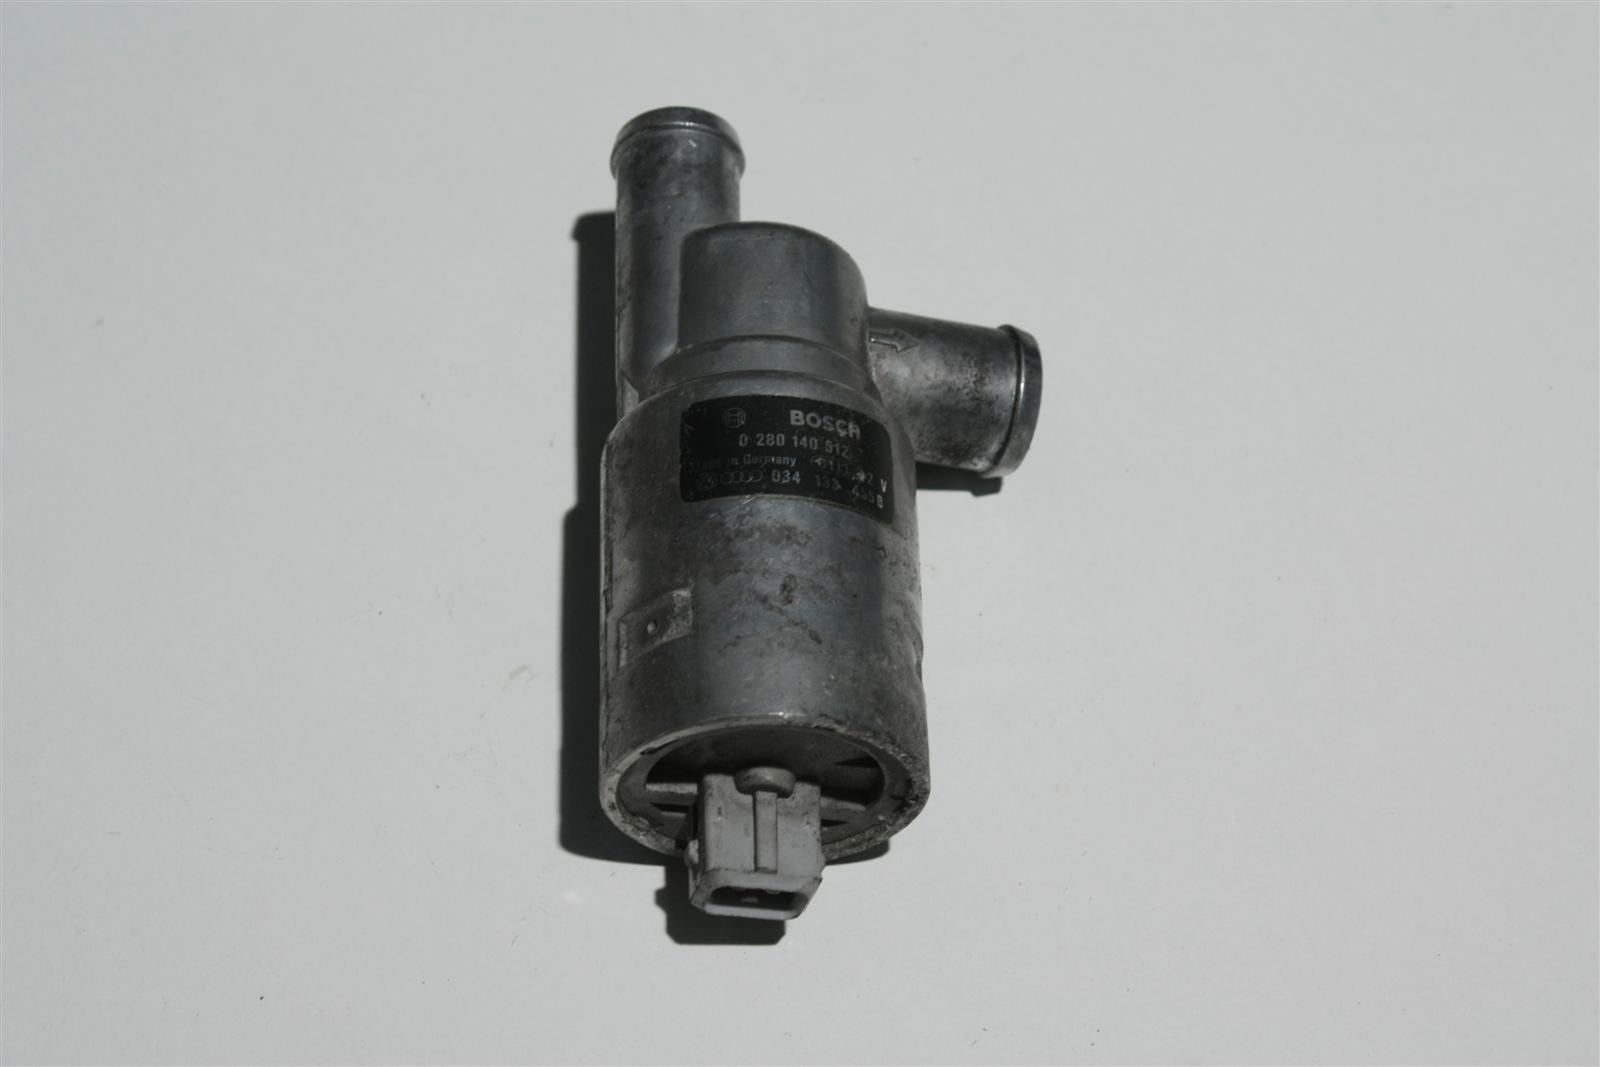 Audi 80/100/200/S2/S4/S6 C4 2.0-2.3l 5 Zylinder Leerlaufregelventil 034133455B